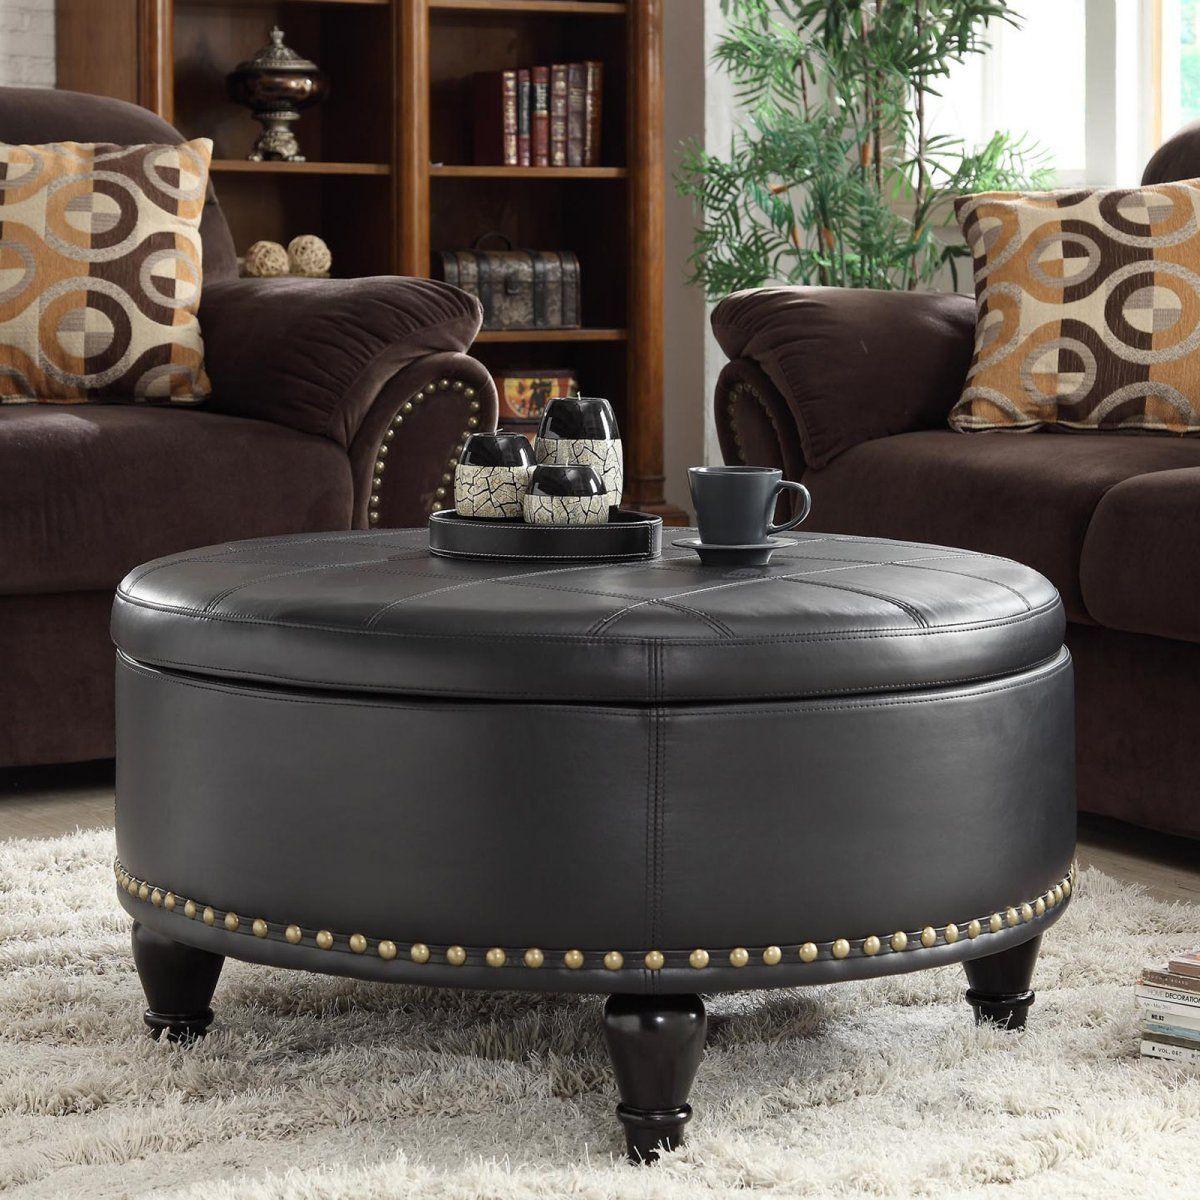 Unique And Creative Tufted Leather Ottoman Coffee Table Round Storage Ottoman Leather Storage Ottoman Furniture